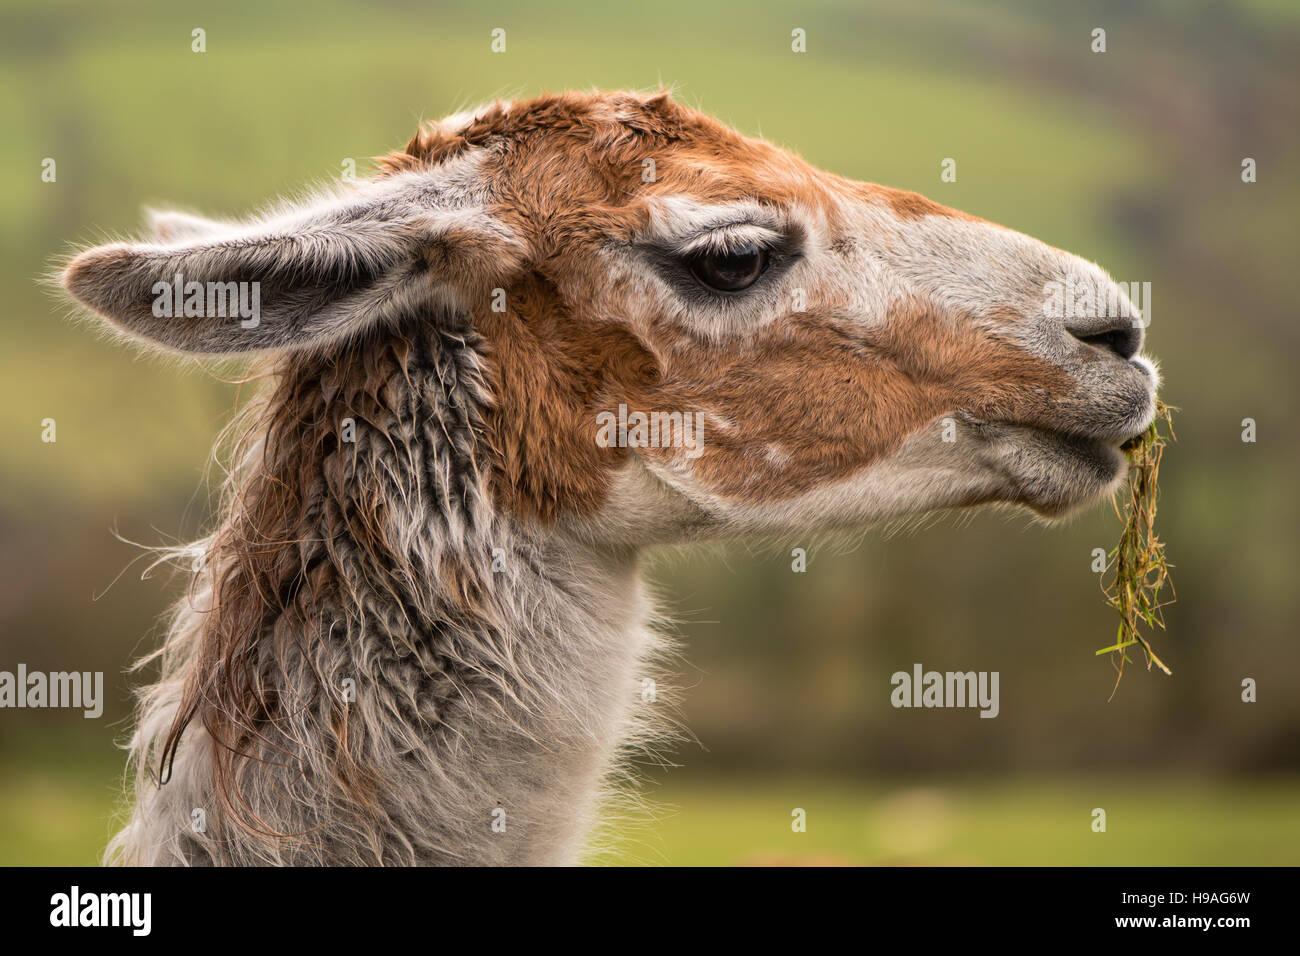 Alpaca Eating Grass Stockfotos & Alpaca Eating Grass